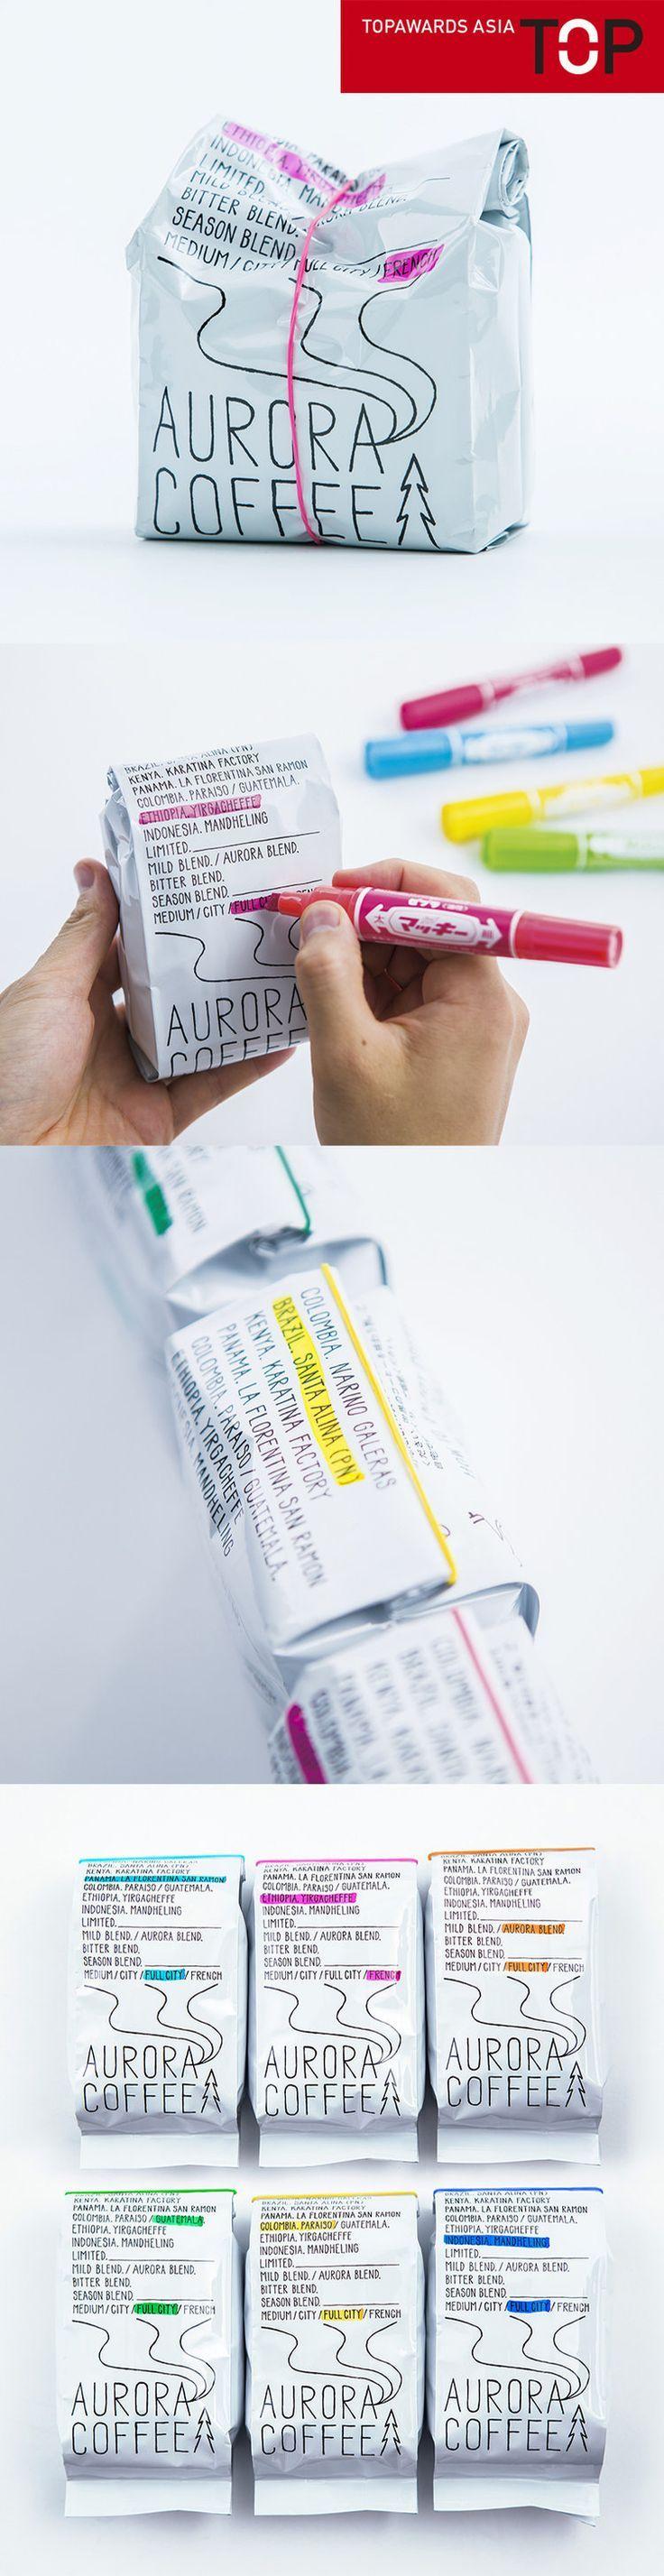 AURORA COFFEE — Topawards Asia